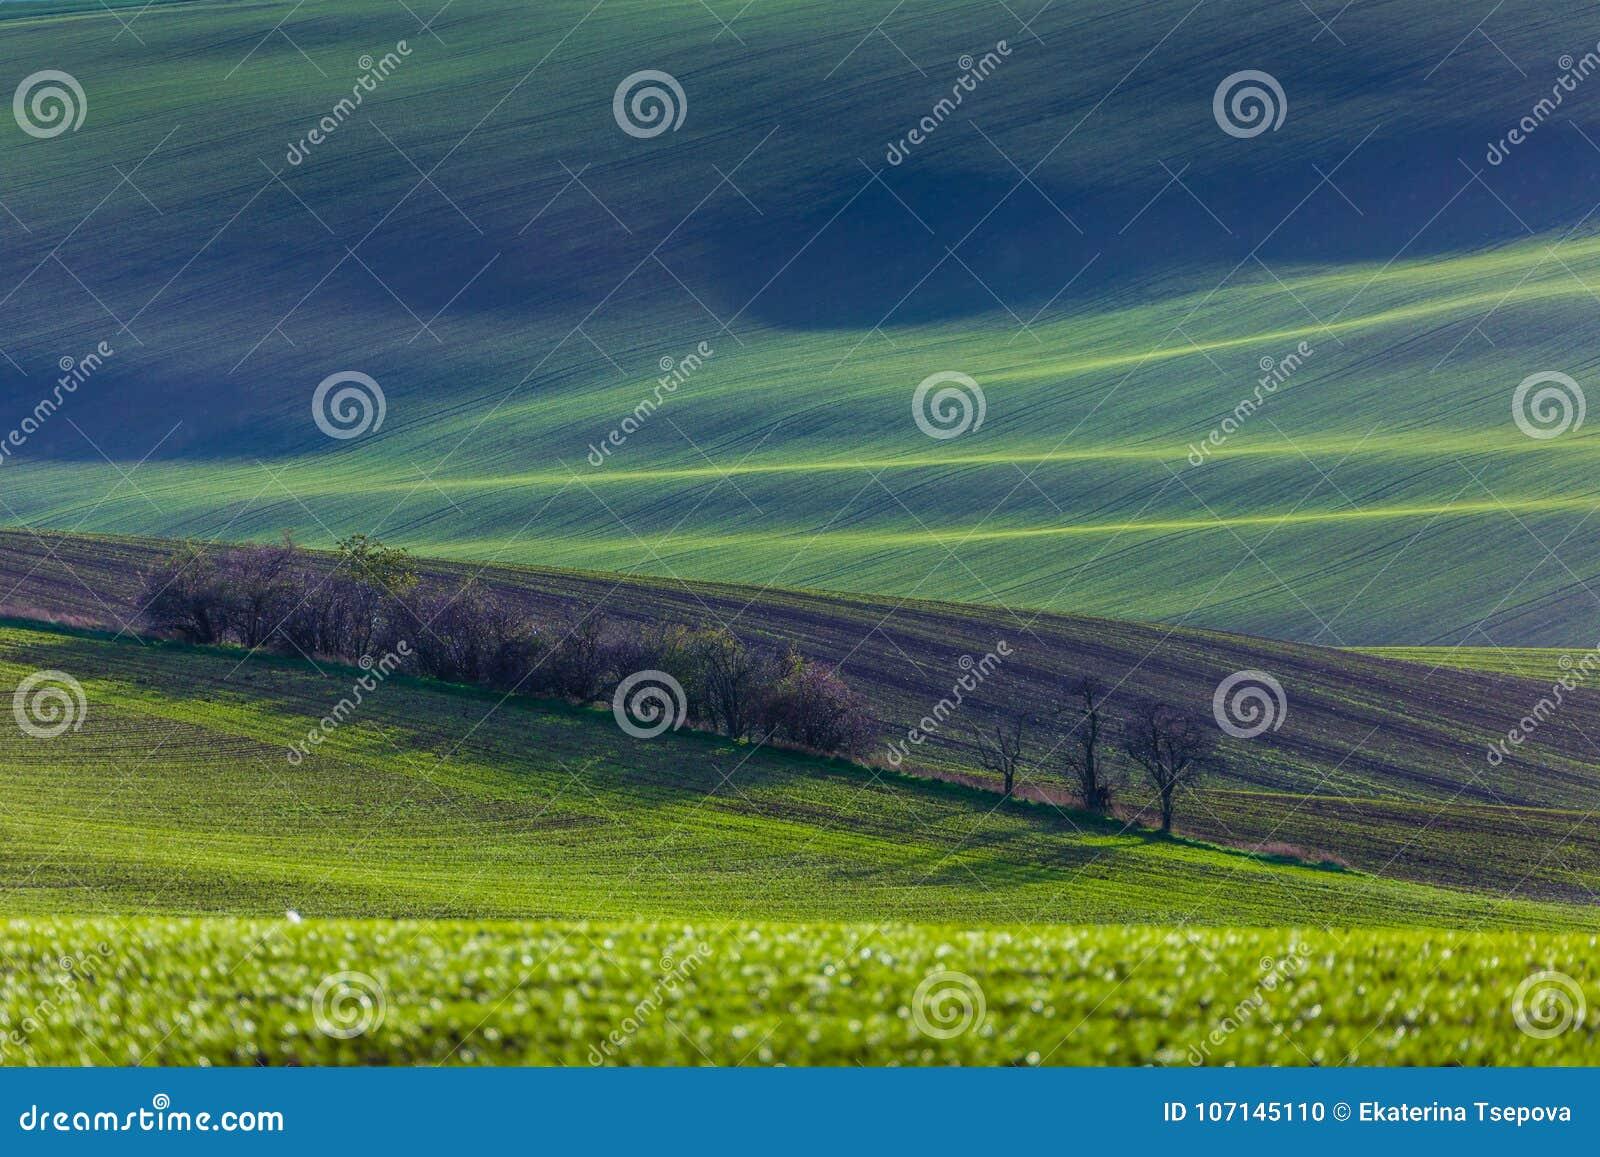 Green hills of Moravia